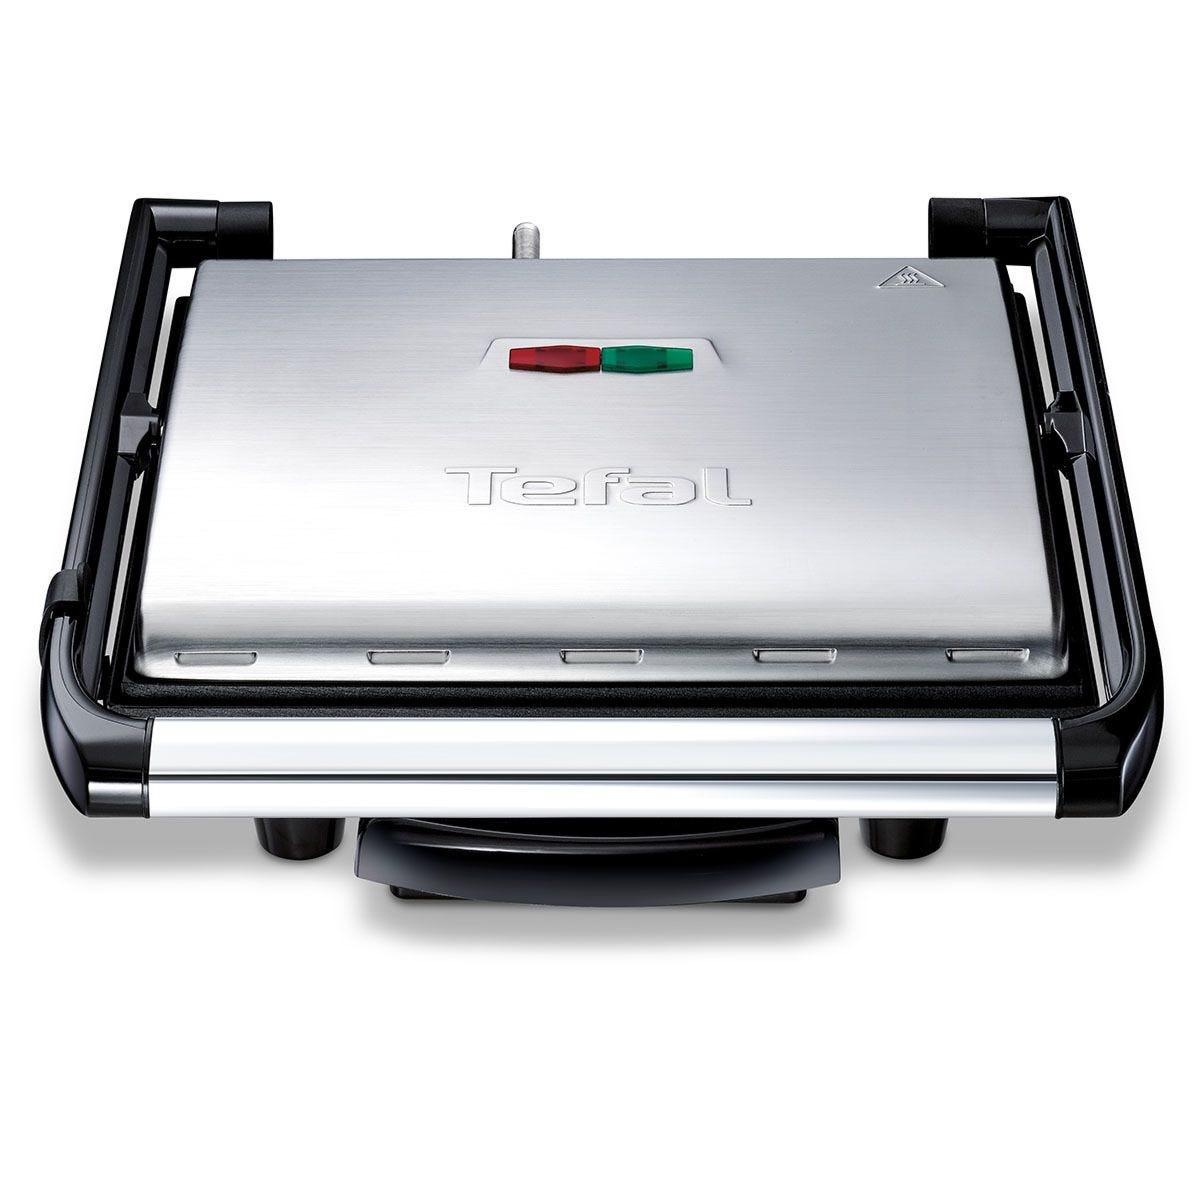 Tefal GC241D40 Inicio 2000W Multifunctional Grill – Black & Silver